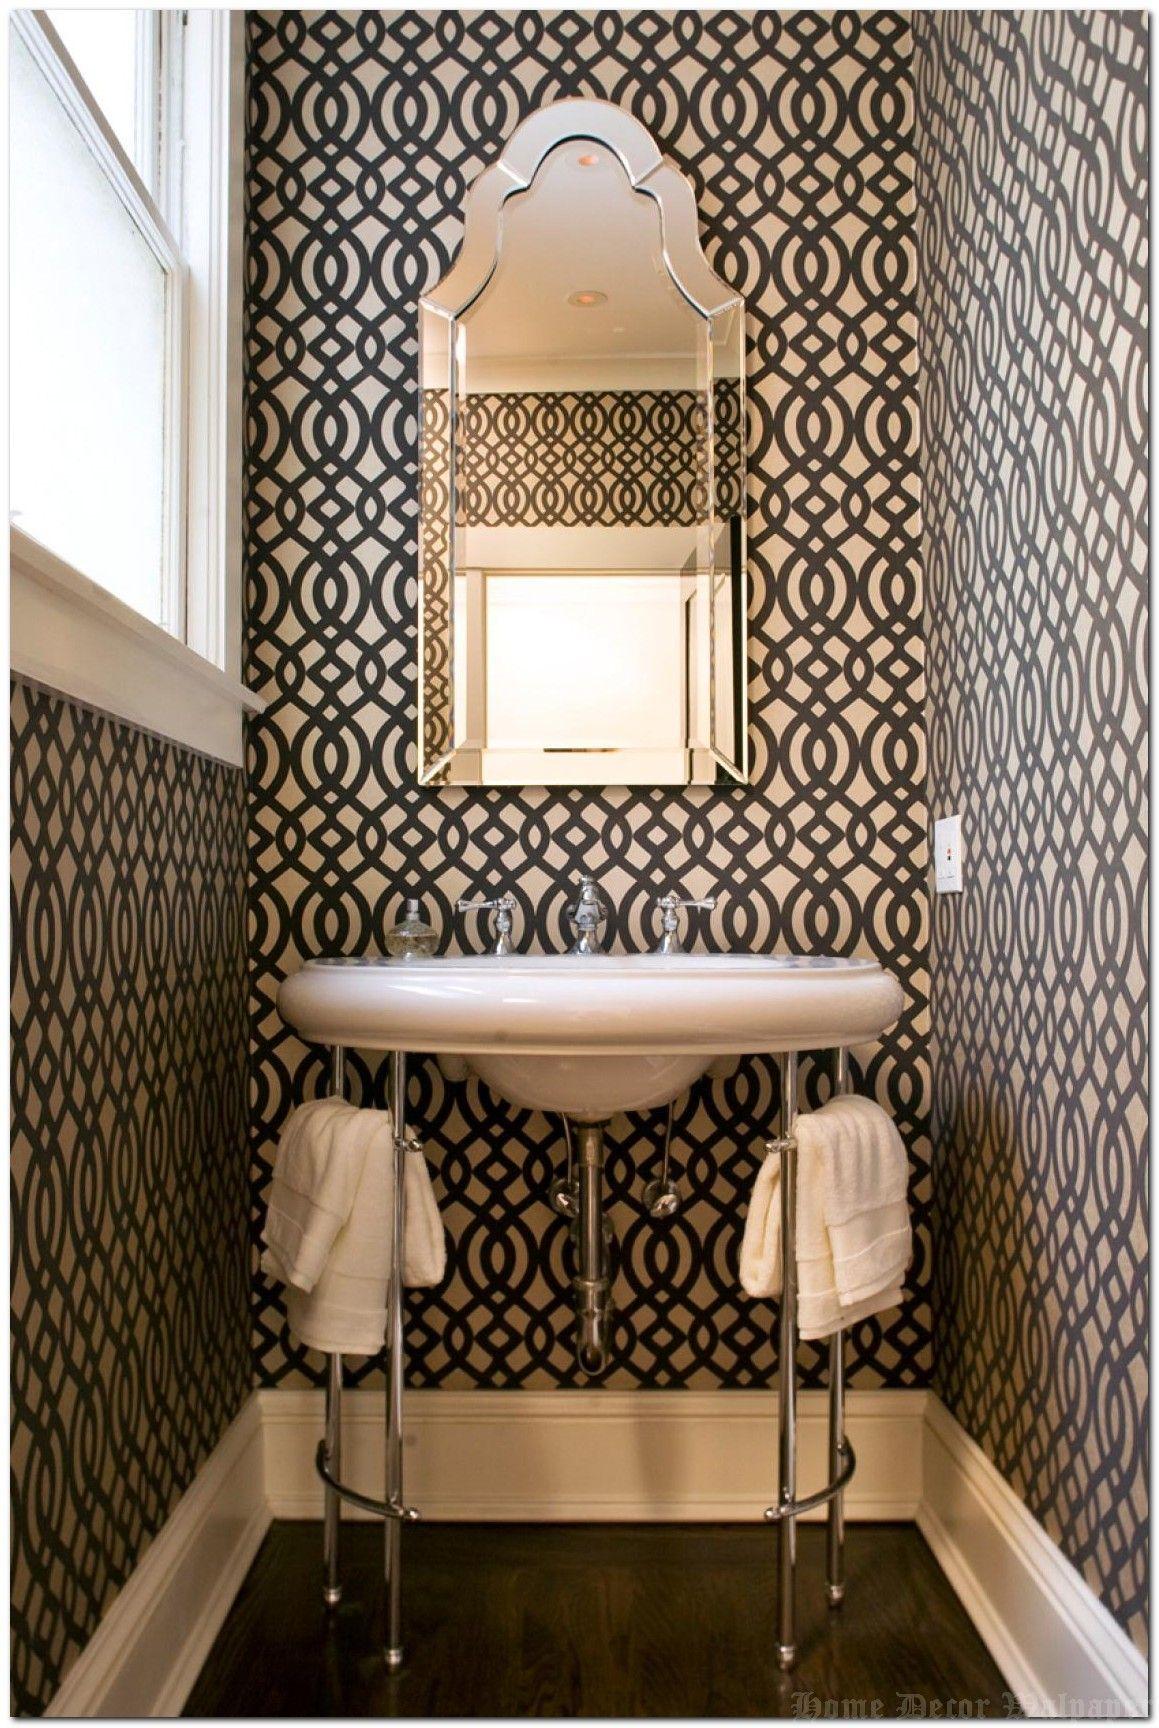 Home Decor Wallpaper 194 In 2020 Mirror Wall Bedroom Mirror Wall Mirror Design Wall